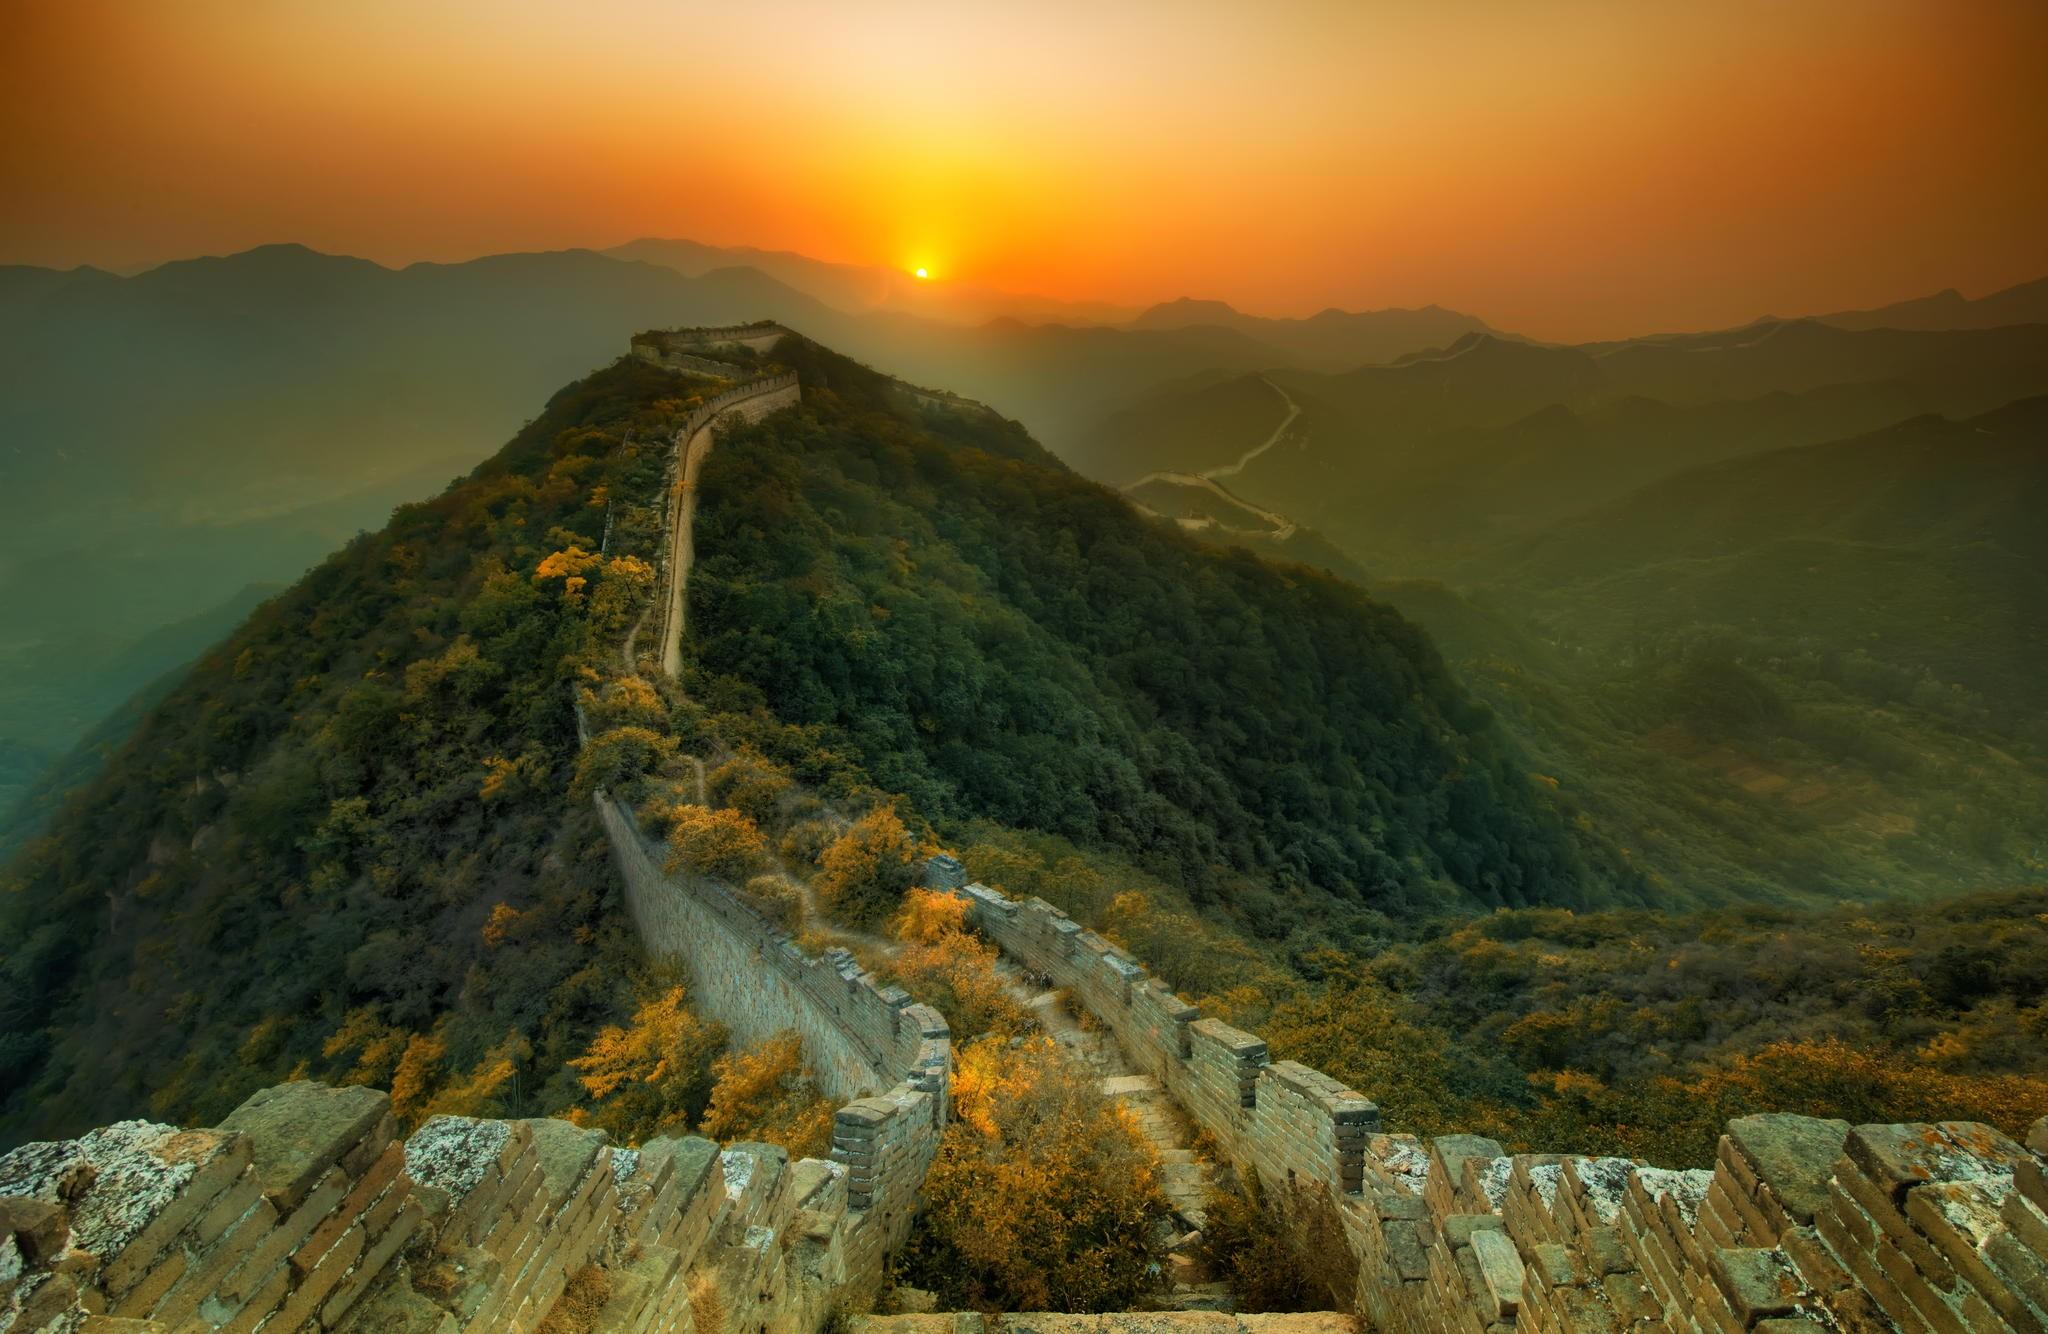 great-wall-of-china-sunset-landscape-mountains-panorama-2048×1334